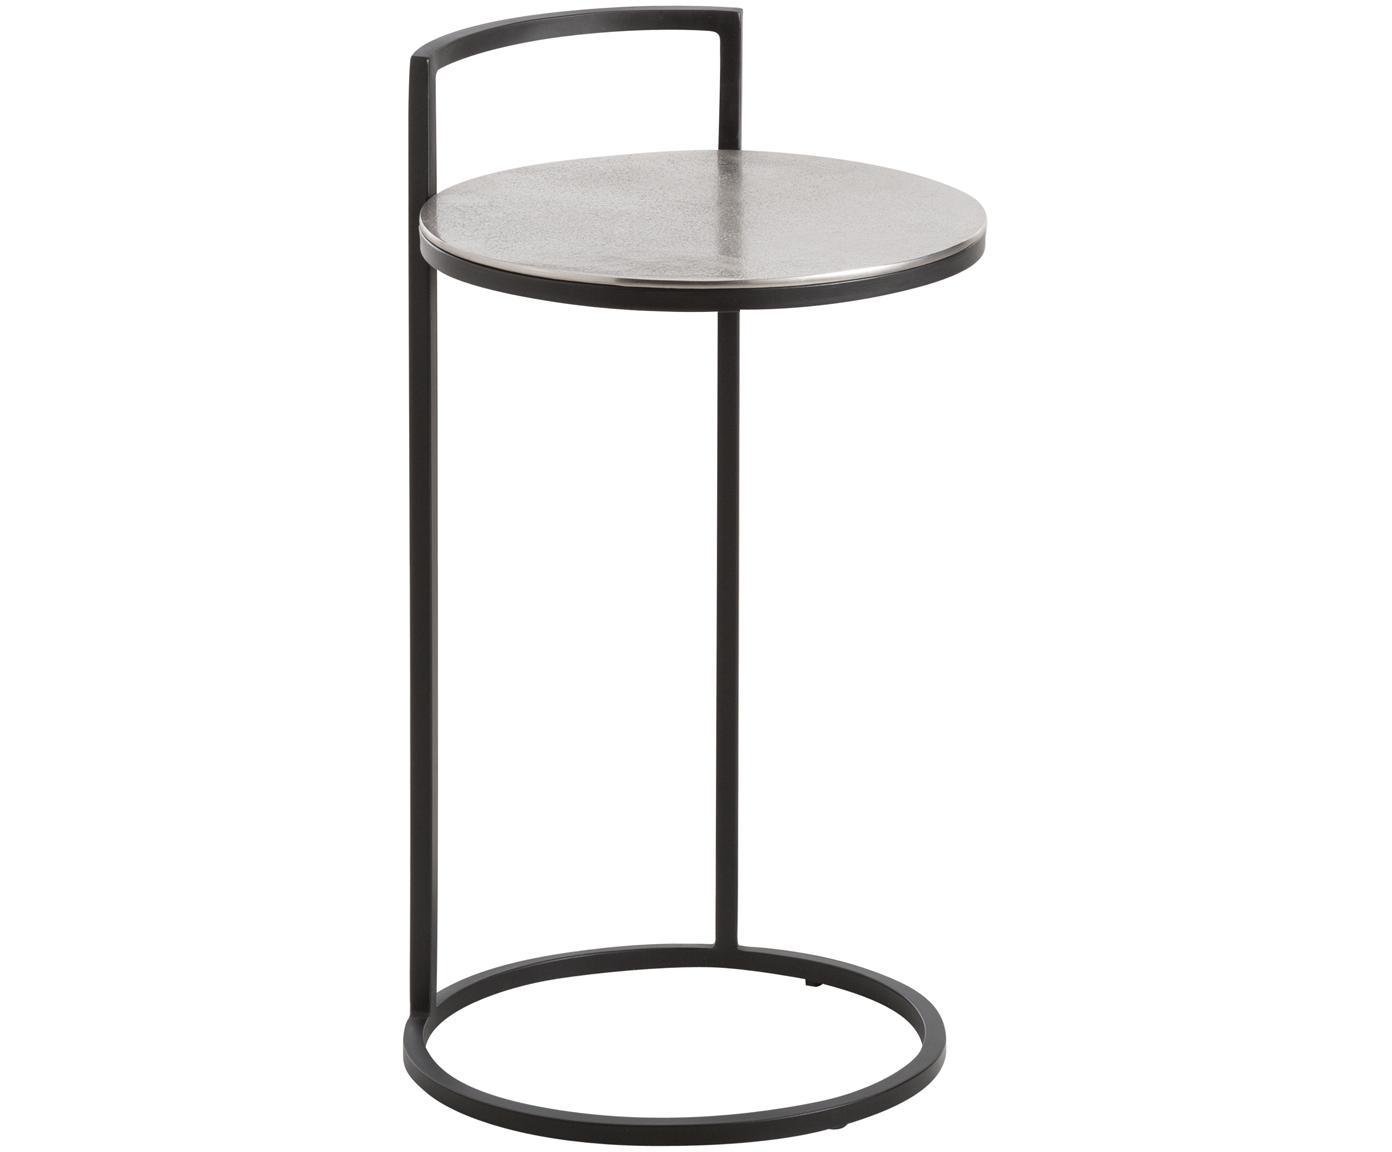 Mesa auxiliar redonda de metal Circle, Tablero: aluminio, recubierto, Estructura: metal pintado, Plata, negro, Ø 36 x Alto 66 cm